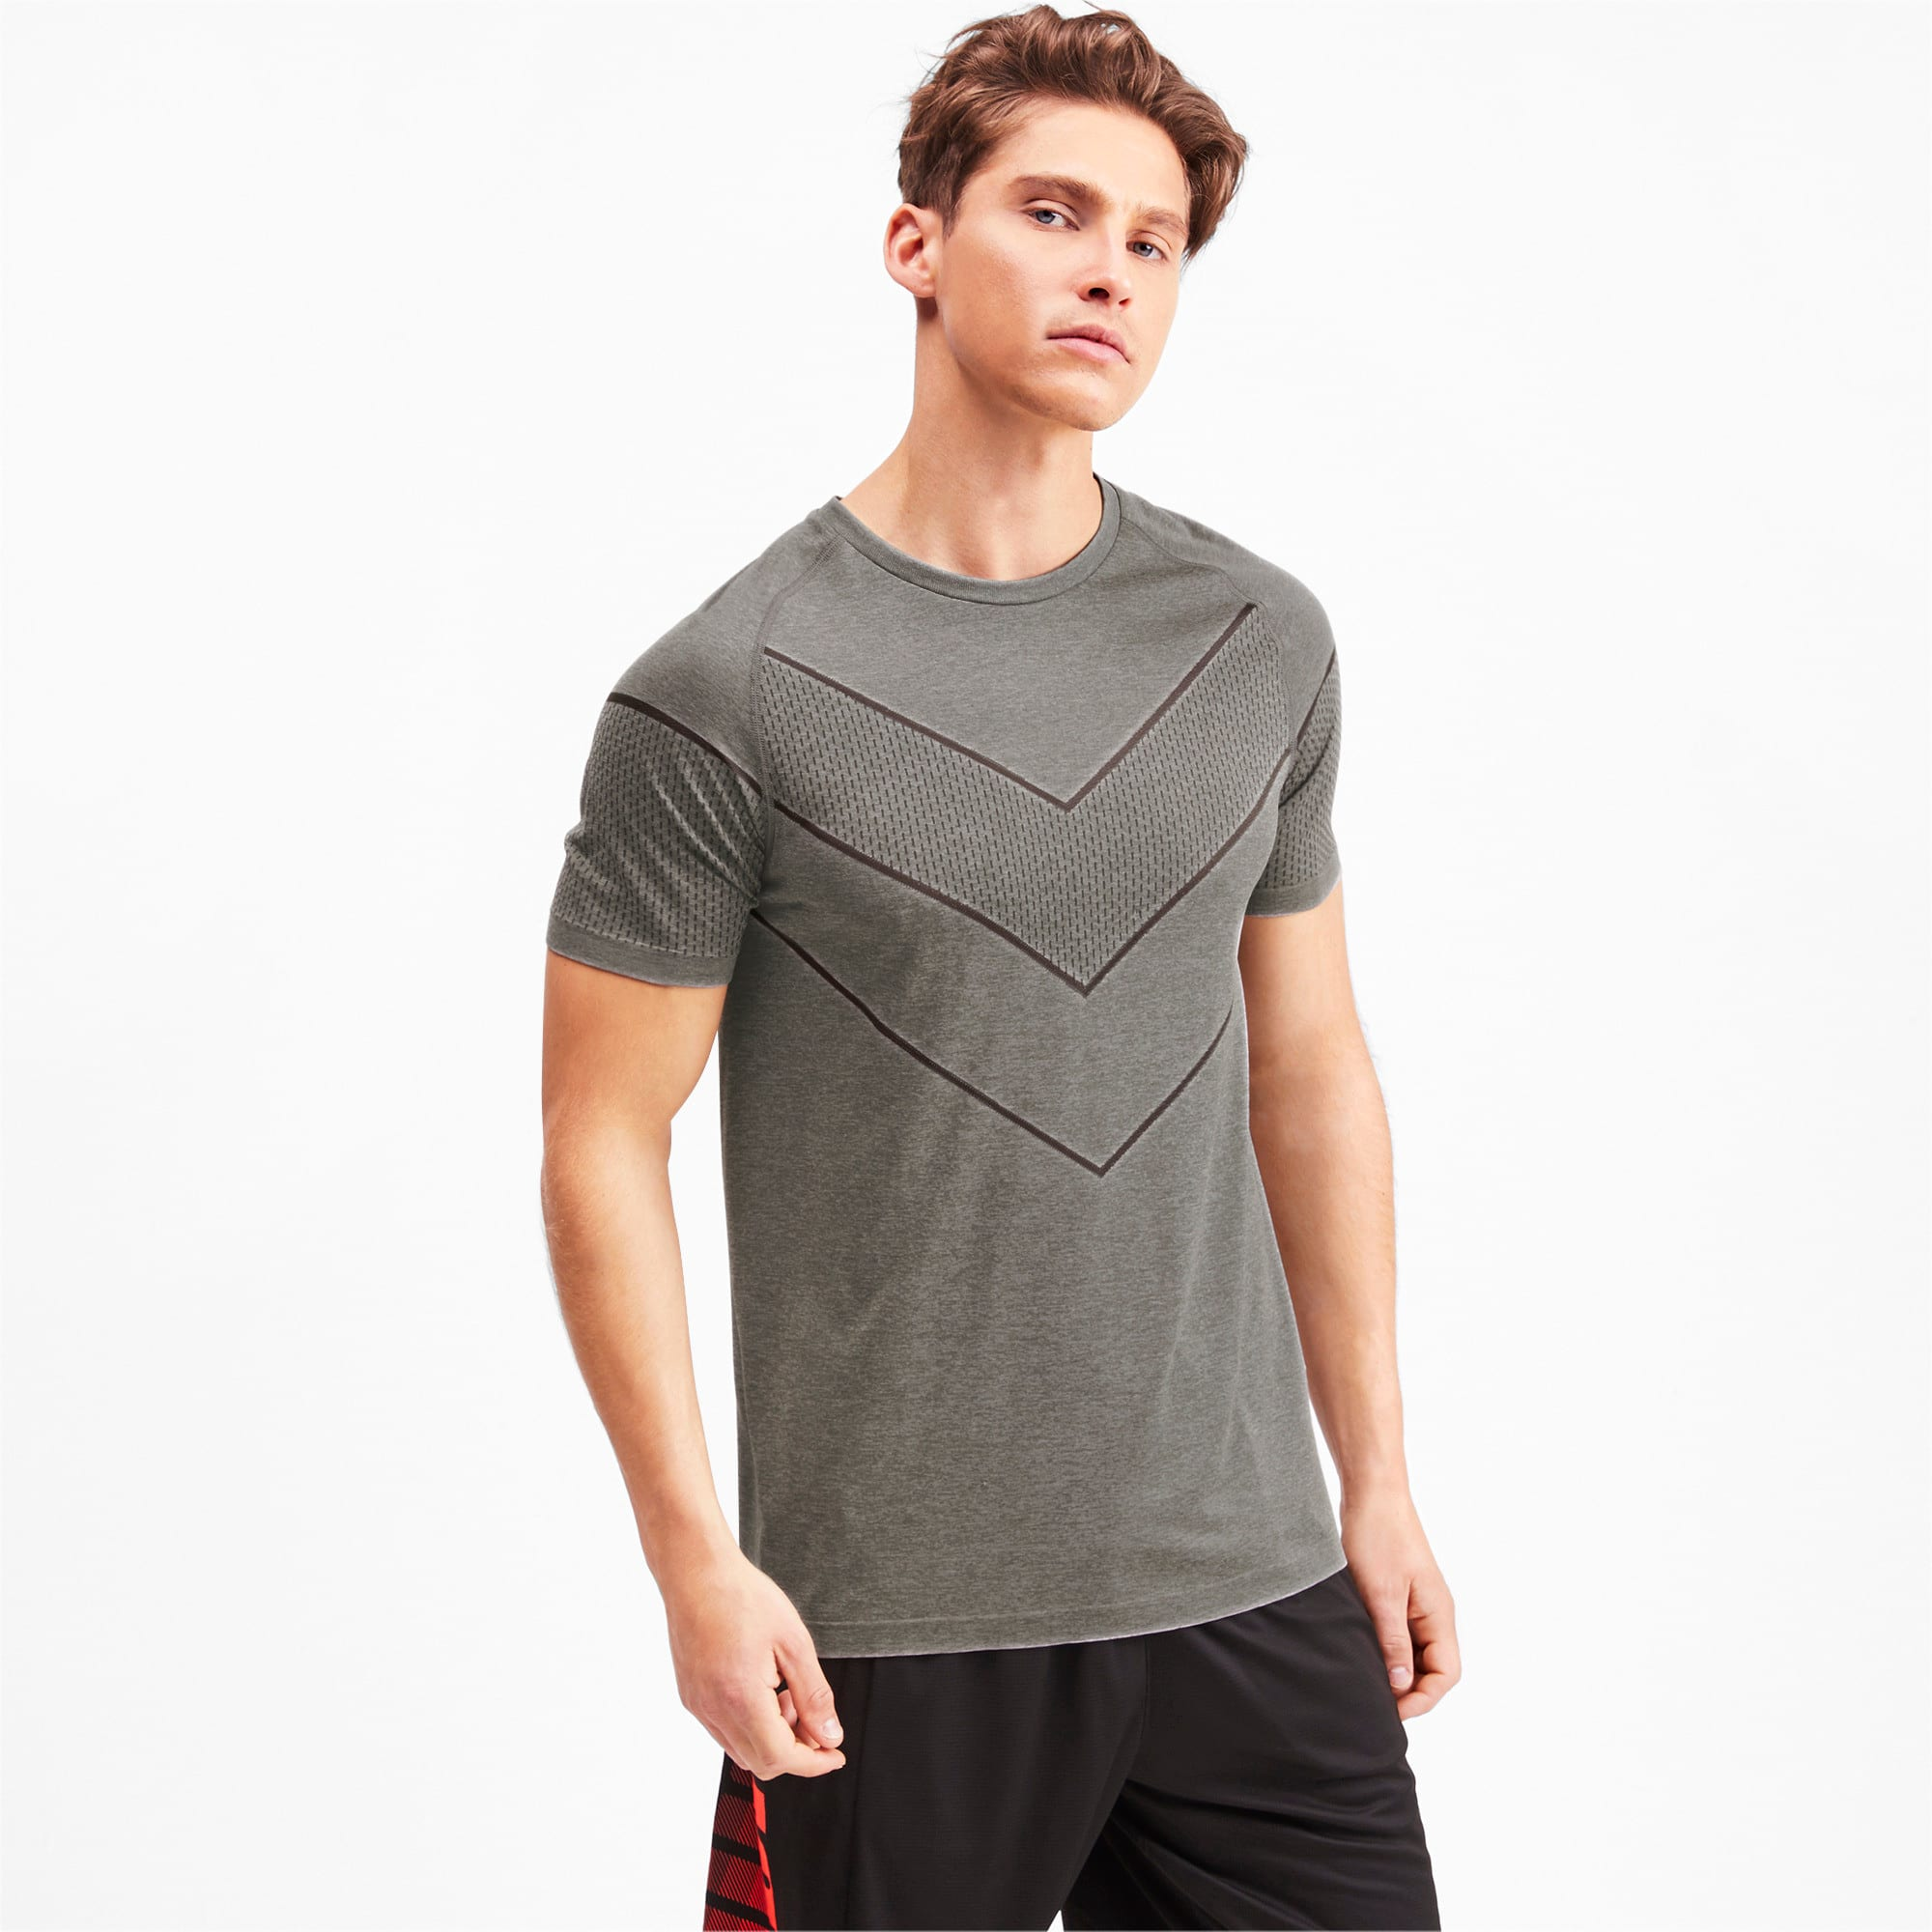 Thumbnail 1 of T-Shirt Reactive evoKNIT pour homme, Medium Gray Heather, medium